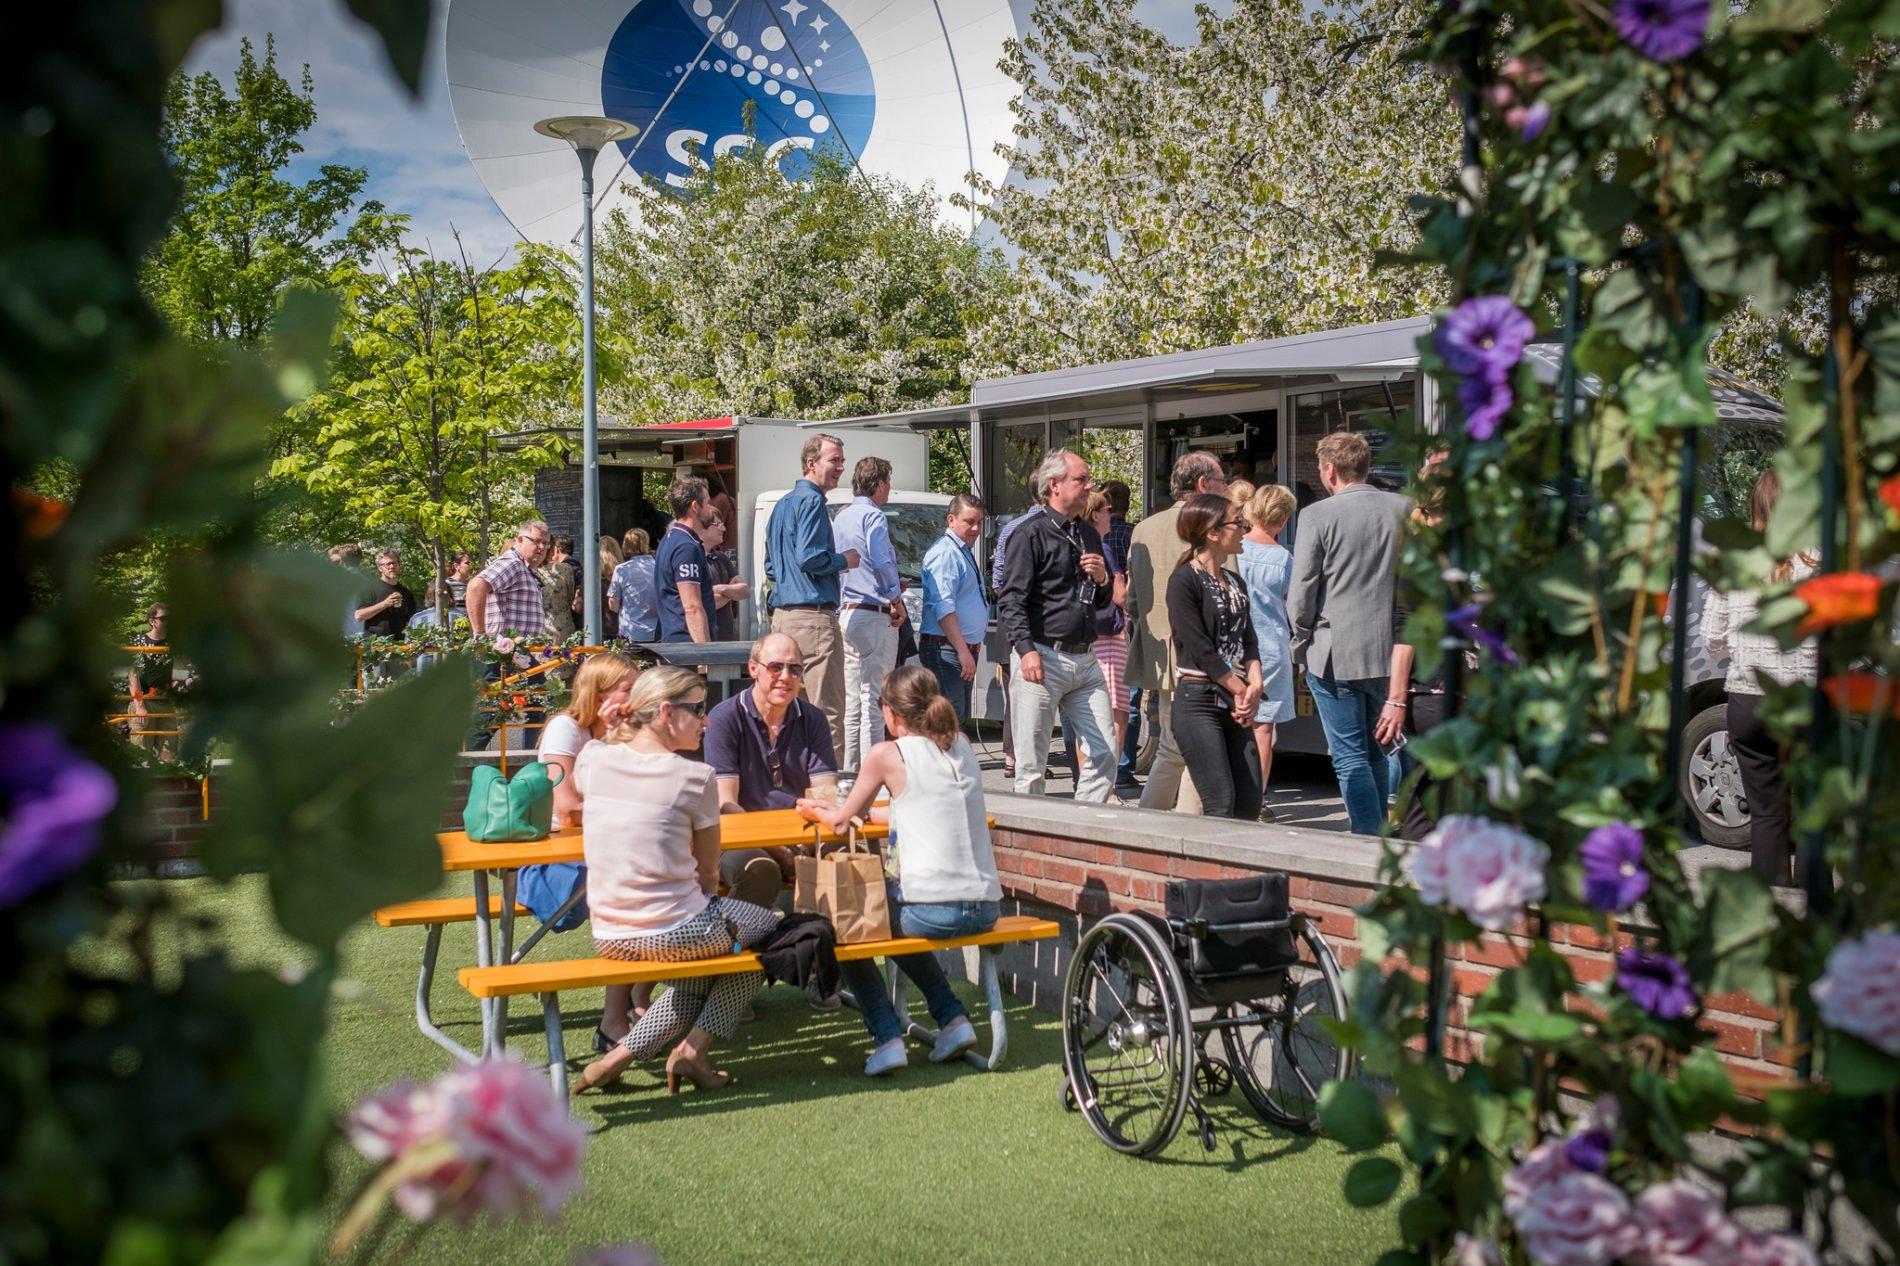 Food park i Solna strand, sommaren 2016